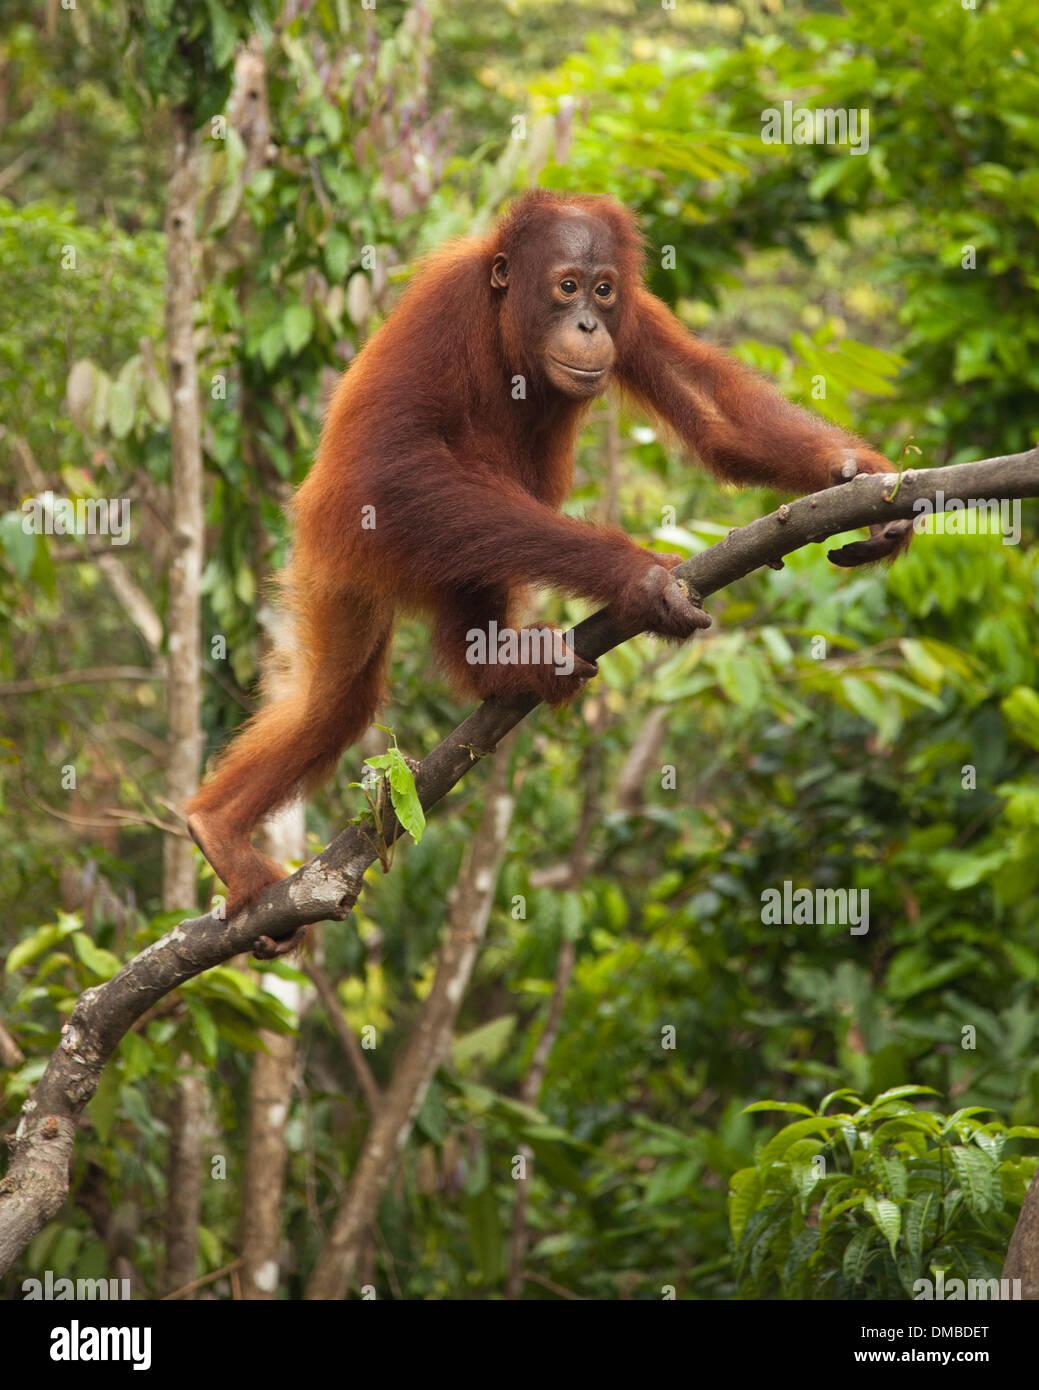 Joven orangután salvaje (Pongo pygmaeus) árbol de escalada en Camp Leakey Imagen De Stock